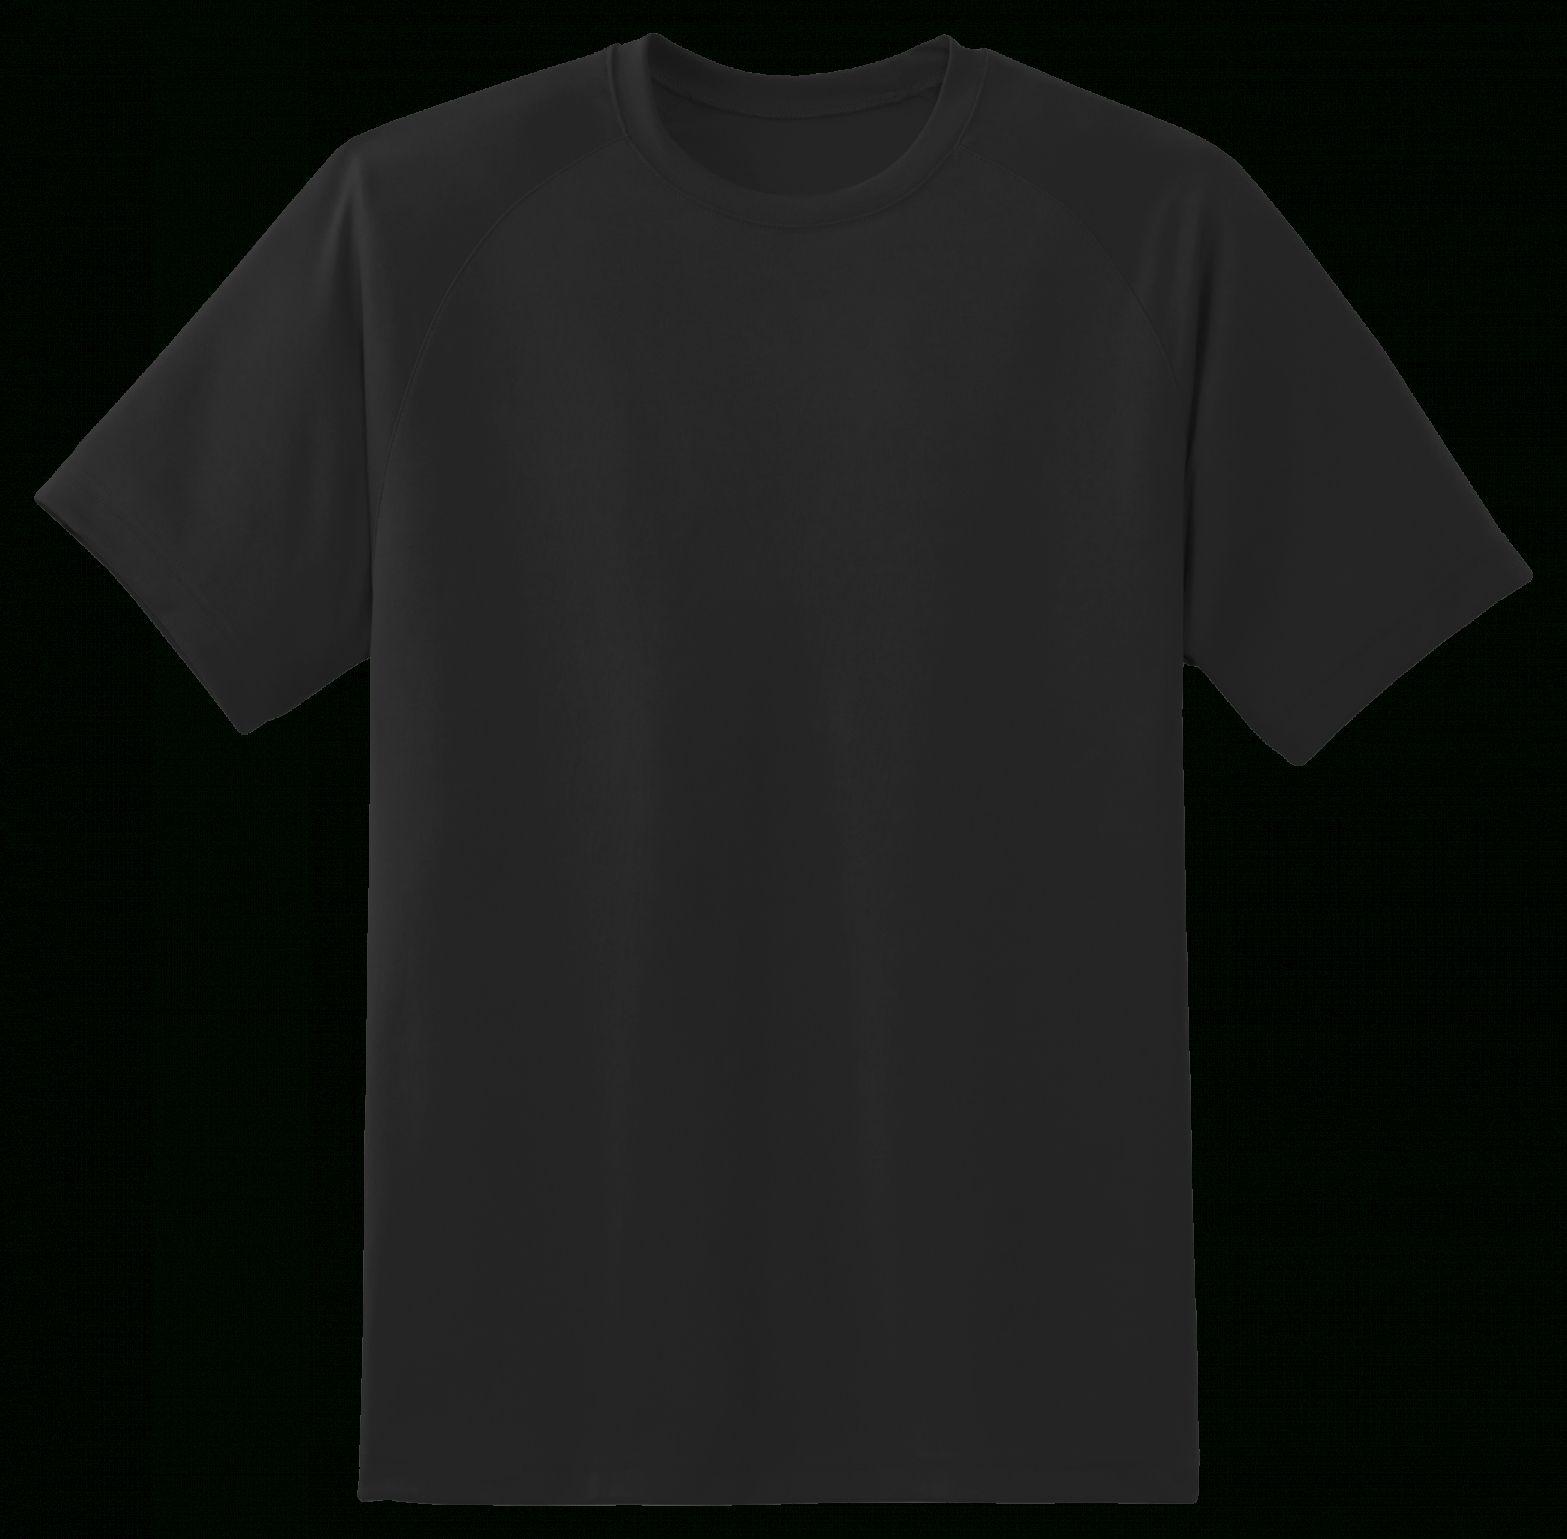 18 Blank T Shirt Png T Shirt Png Blank T Shirts T Shirt